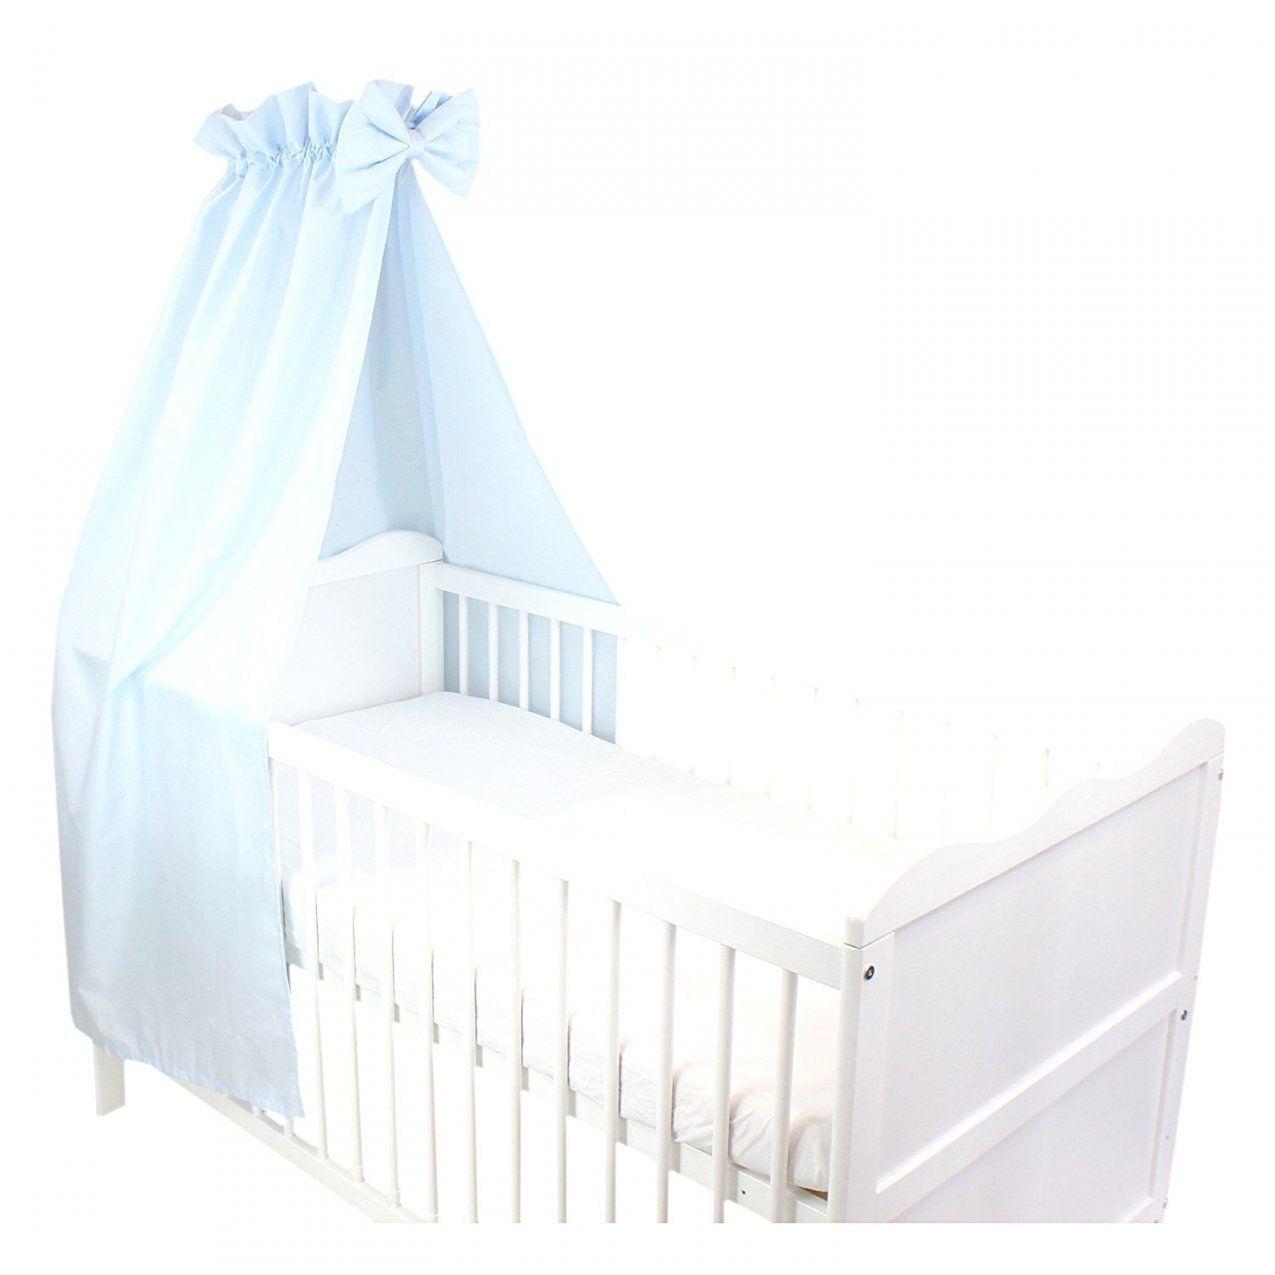 Elegant Himmel Fr Kinderbett Selber Machen Trendy Beautiful Full von Himmel Für Kinderbett Selber Machen Bild